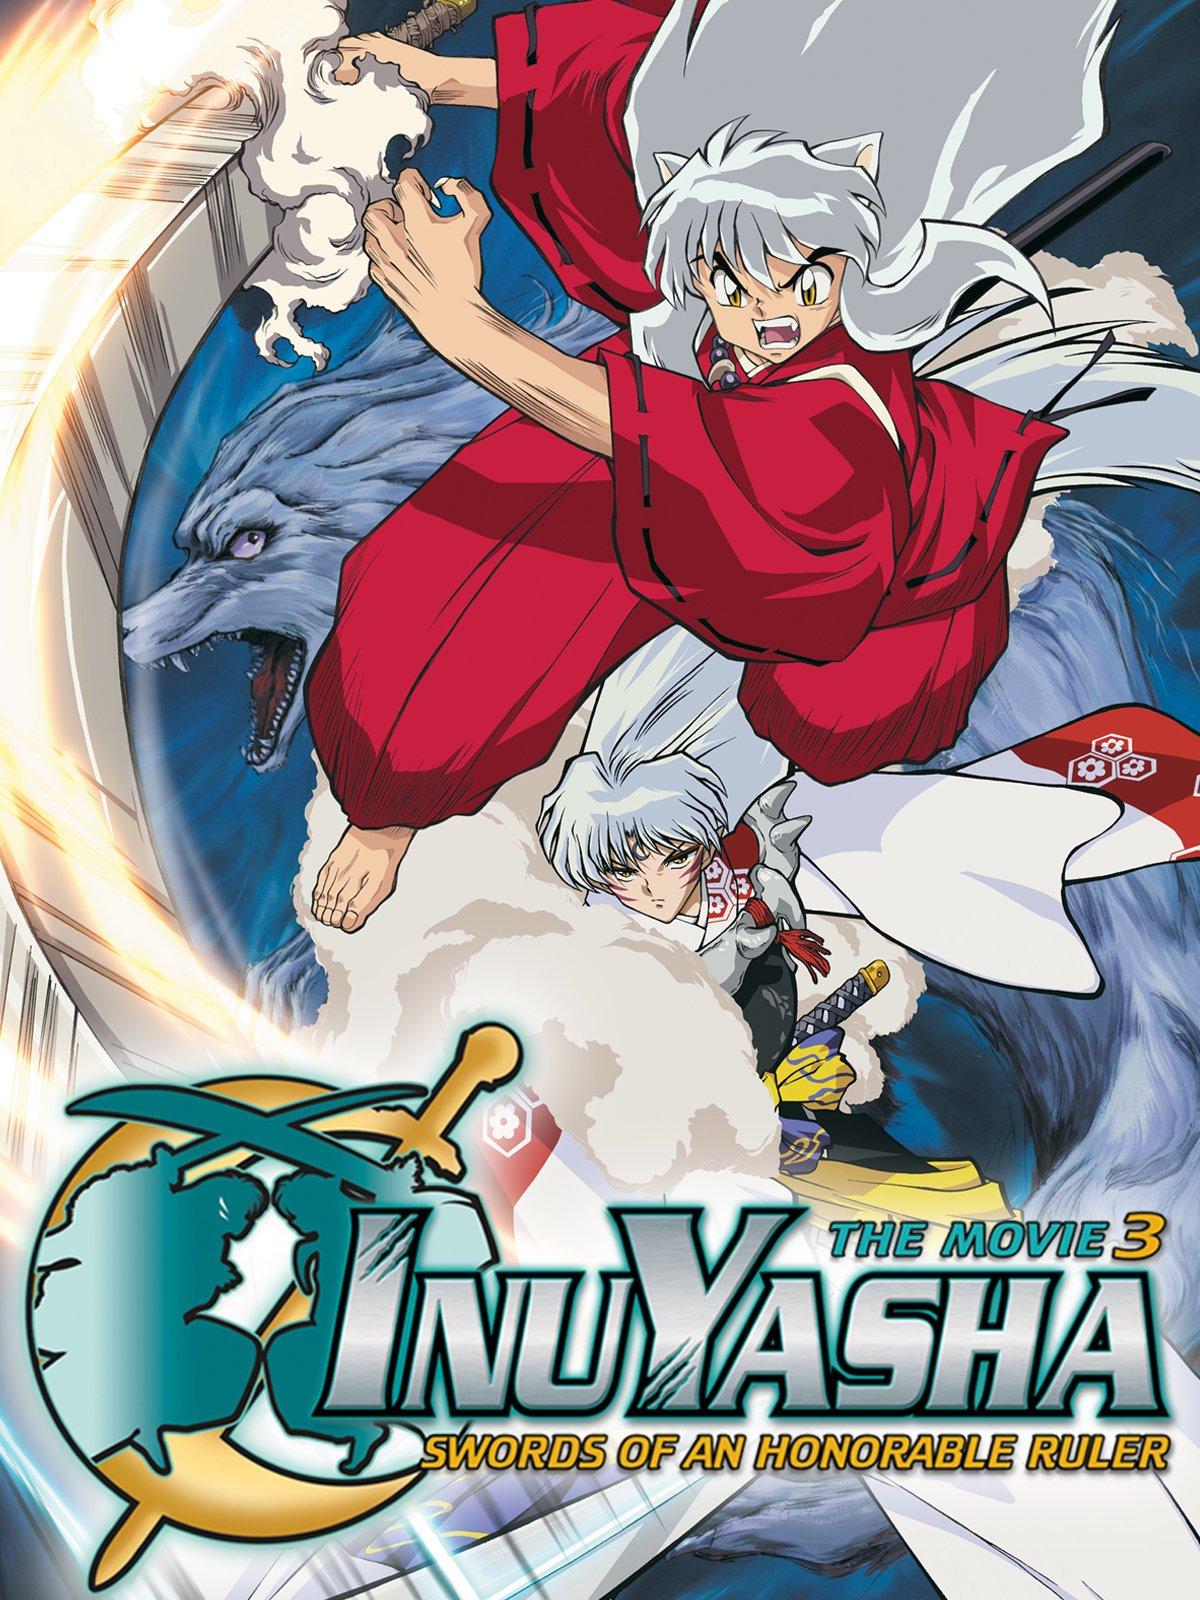 musica inuyasha espanol: